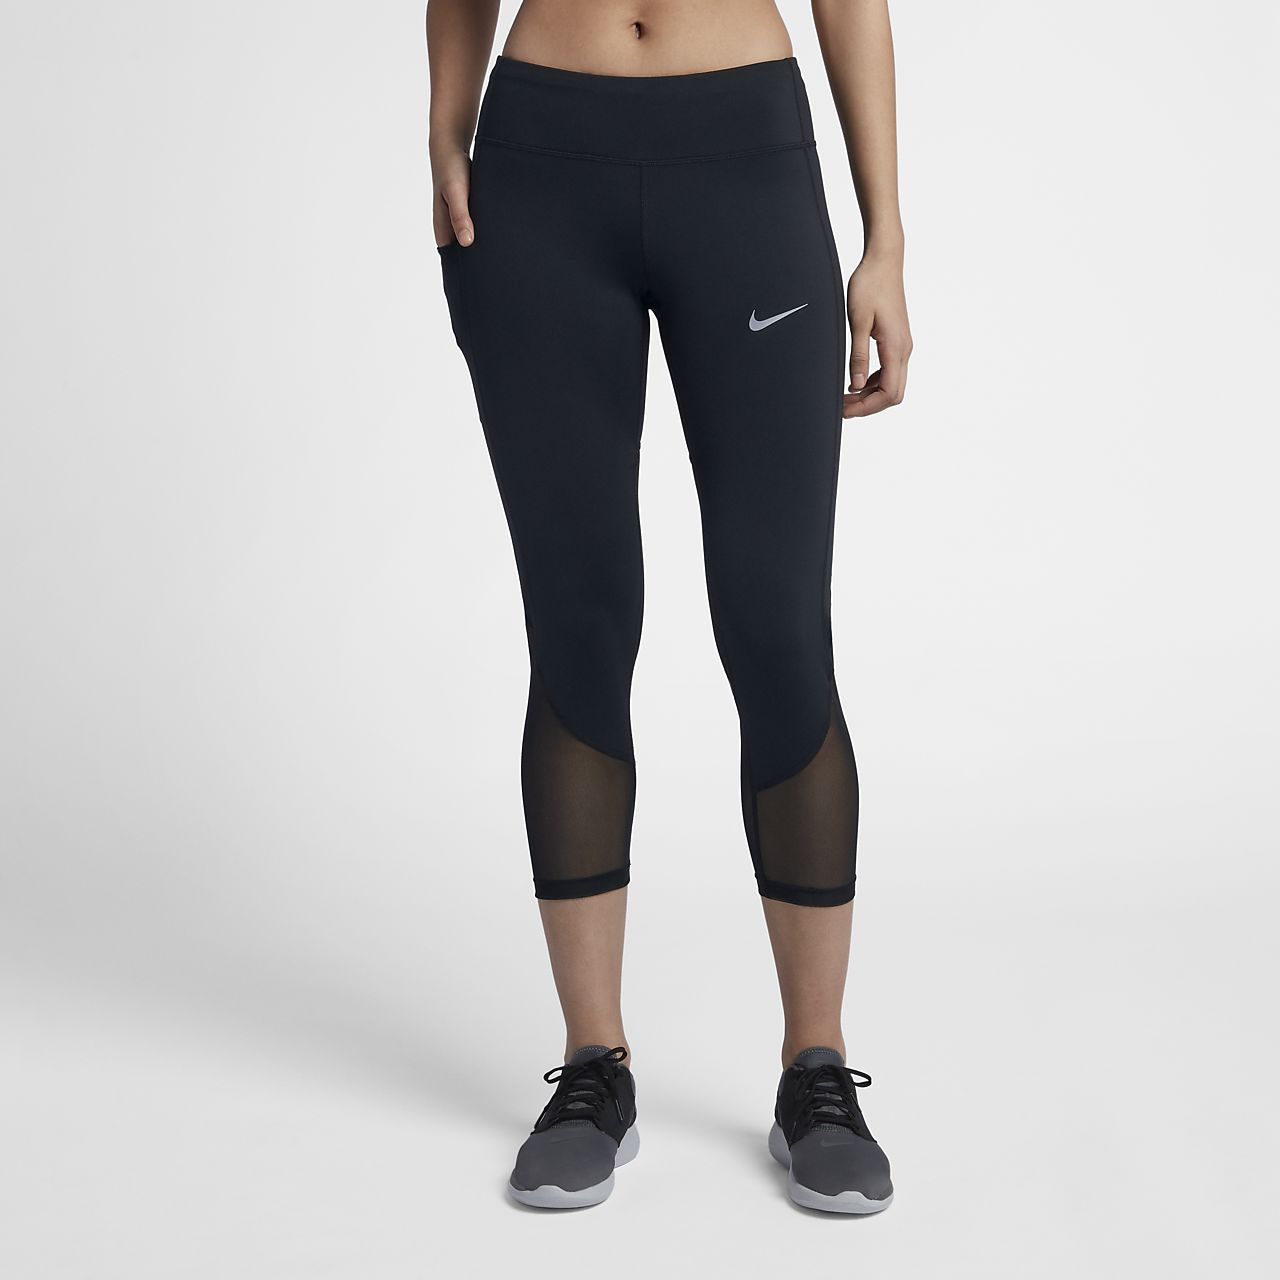 ff3e8a16d7b4 Γυναικείο μεσοκάβαλο κολάν 3 4 για τρέξιμο Nike Power. Nike.com GR